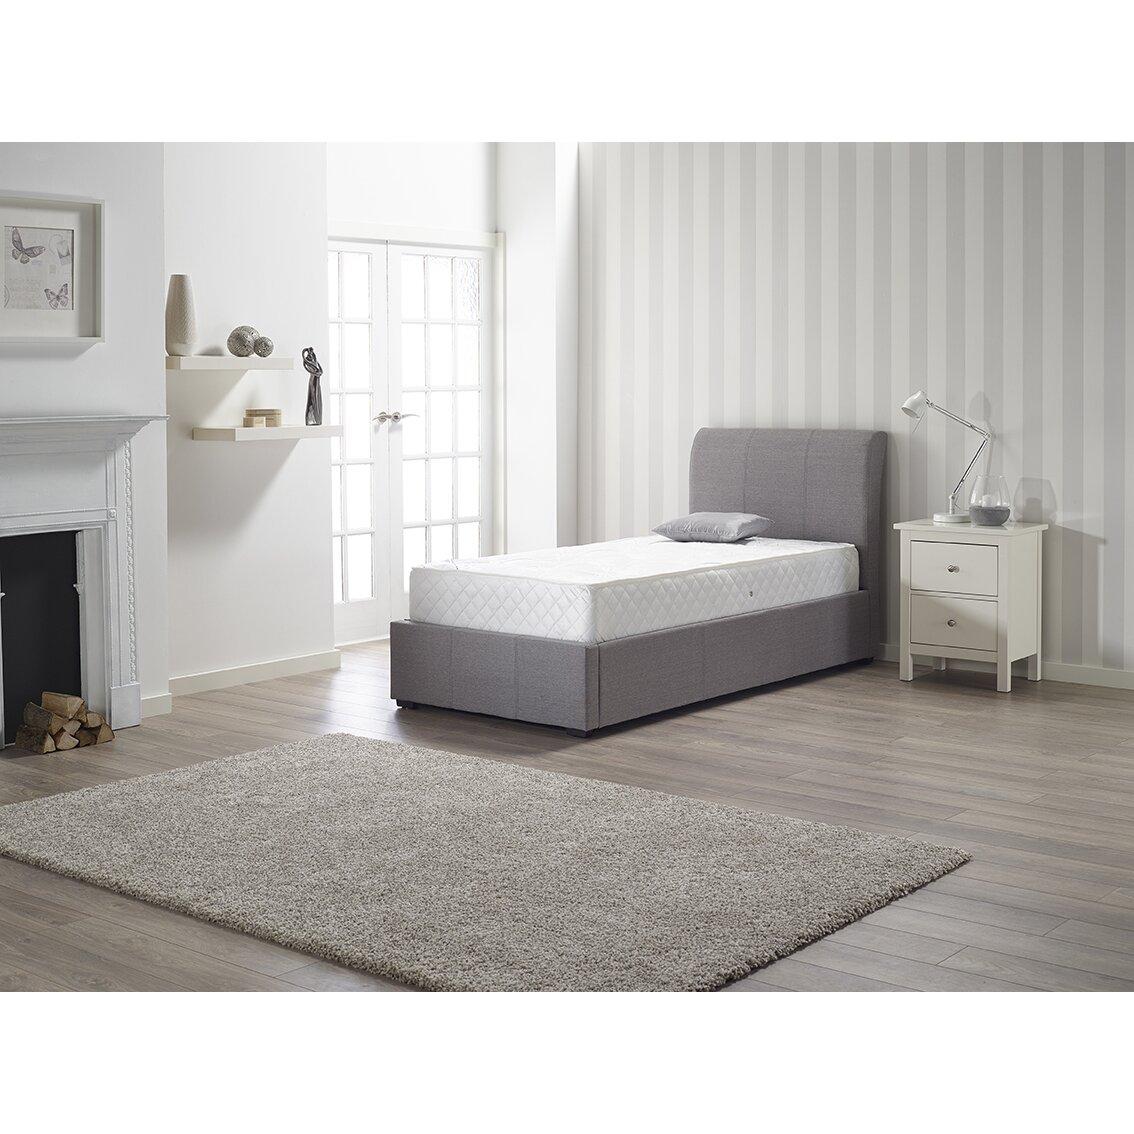 Ottoman Bedroom Dcor Design Venice Upholstered Ottoman Bed Reviews Wayfaircouk